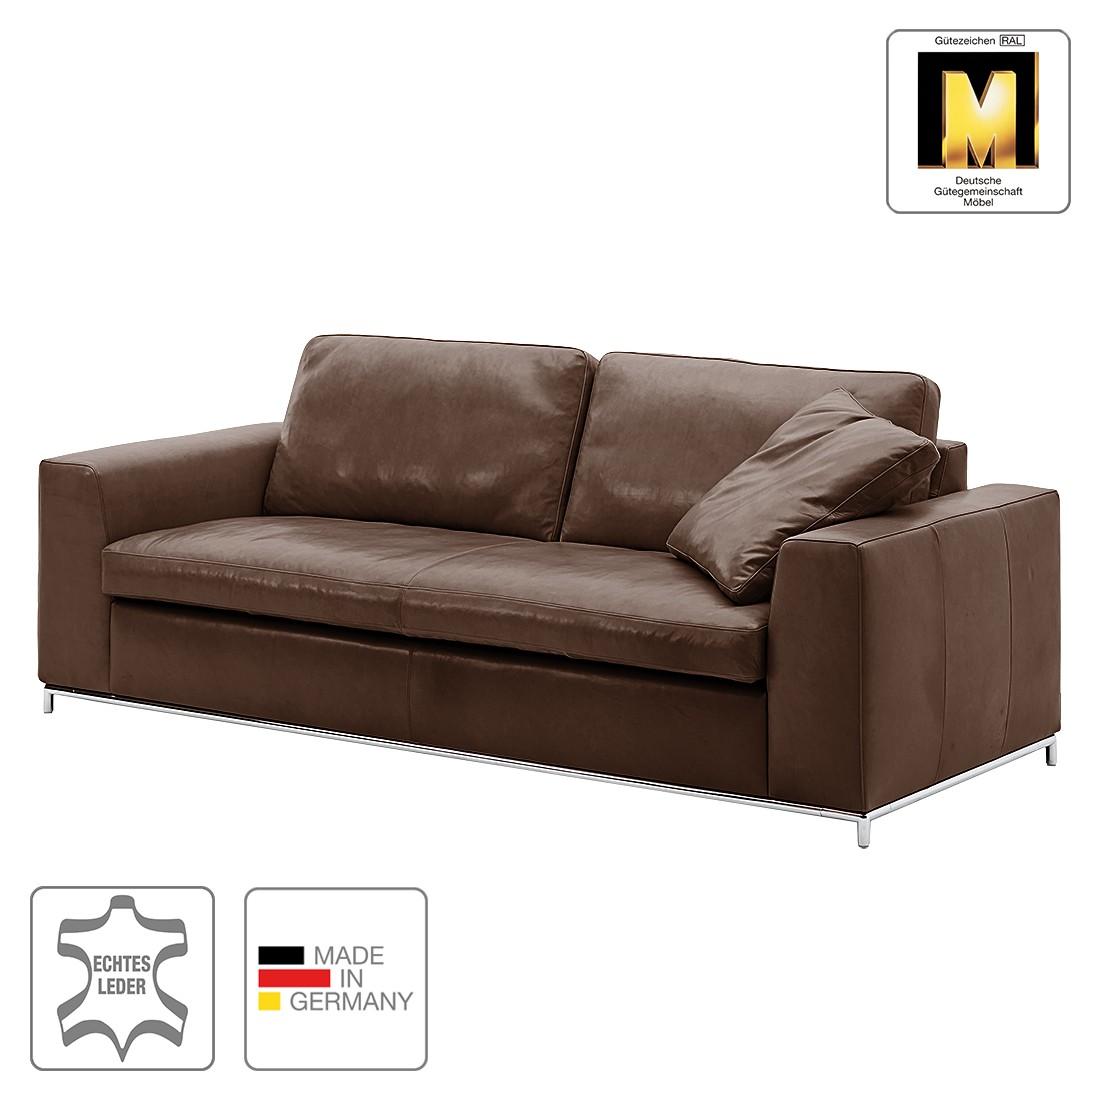 Sofa greg 3 sitzer echtleder anthrazit ohne kissen for Sofa ohne kissen